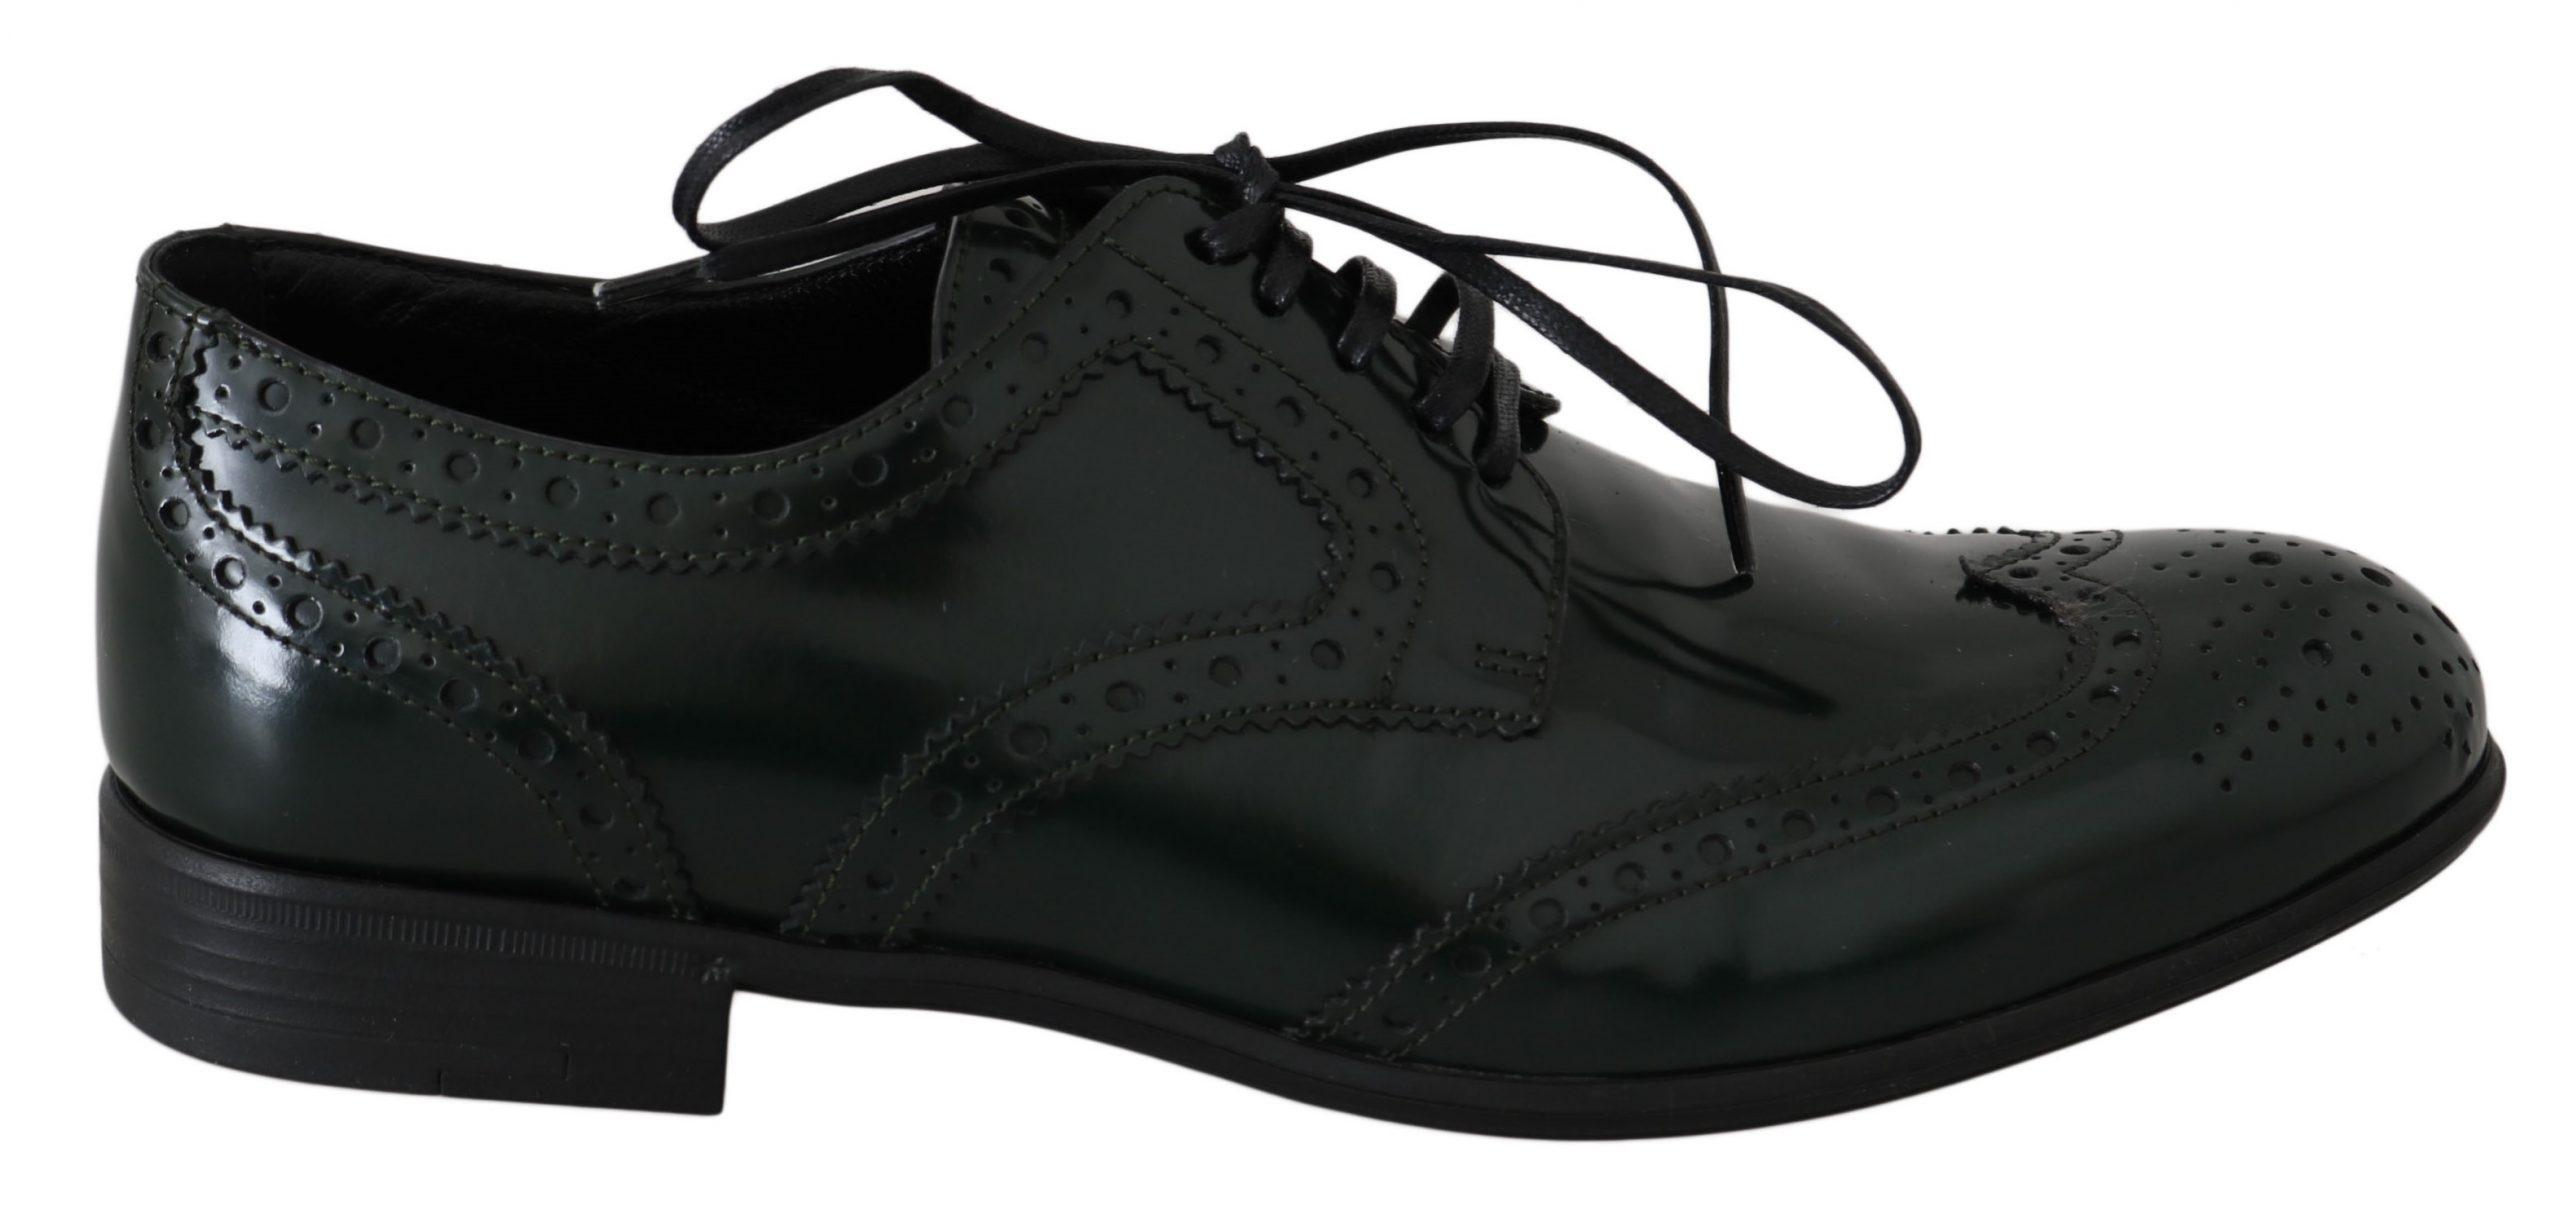 Dolce & Gabbana Men's Leather Wingtip Brogue Shoes Green LA5978 - EU35/US4.5